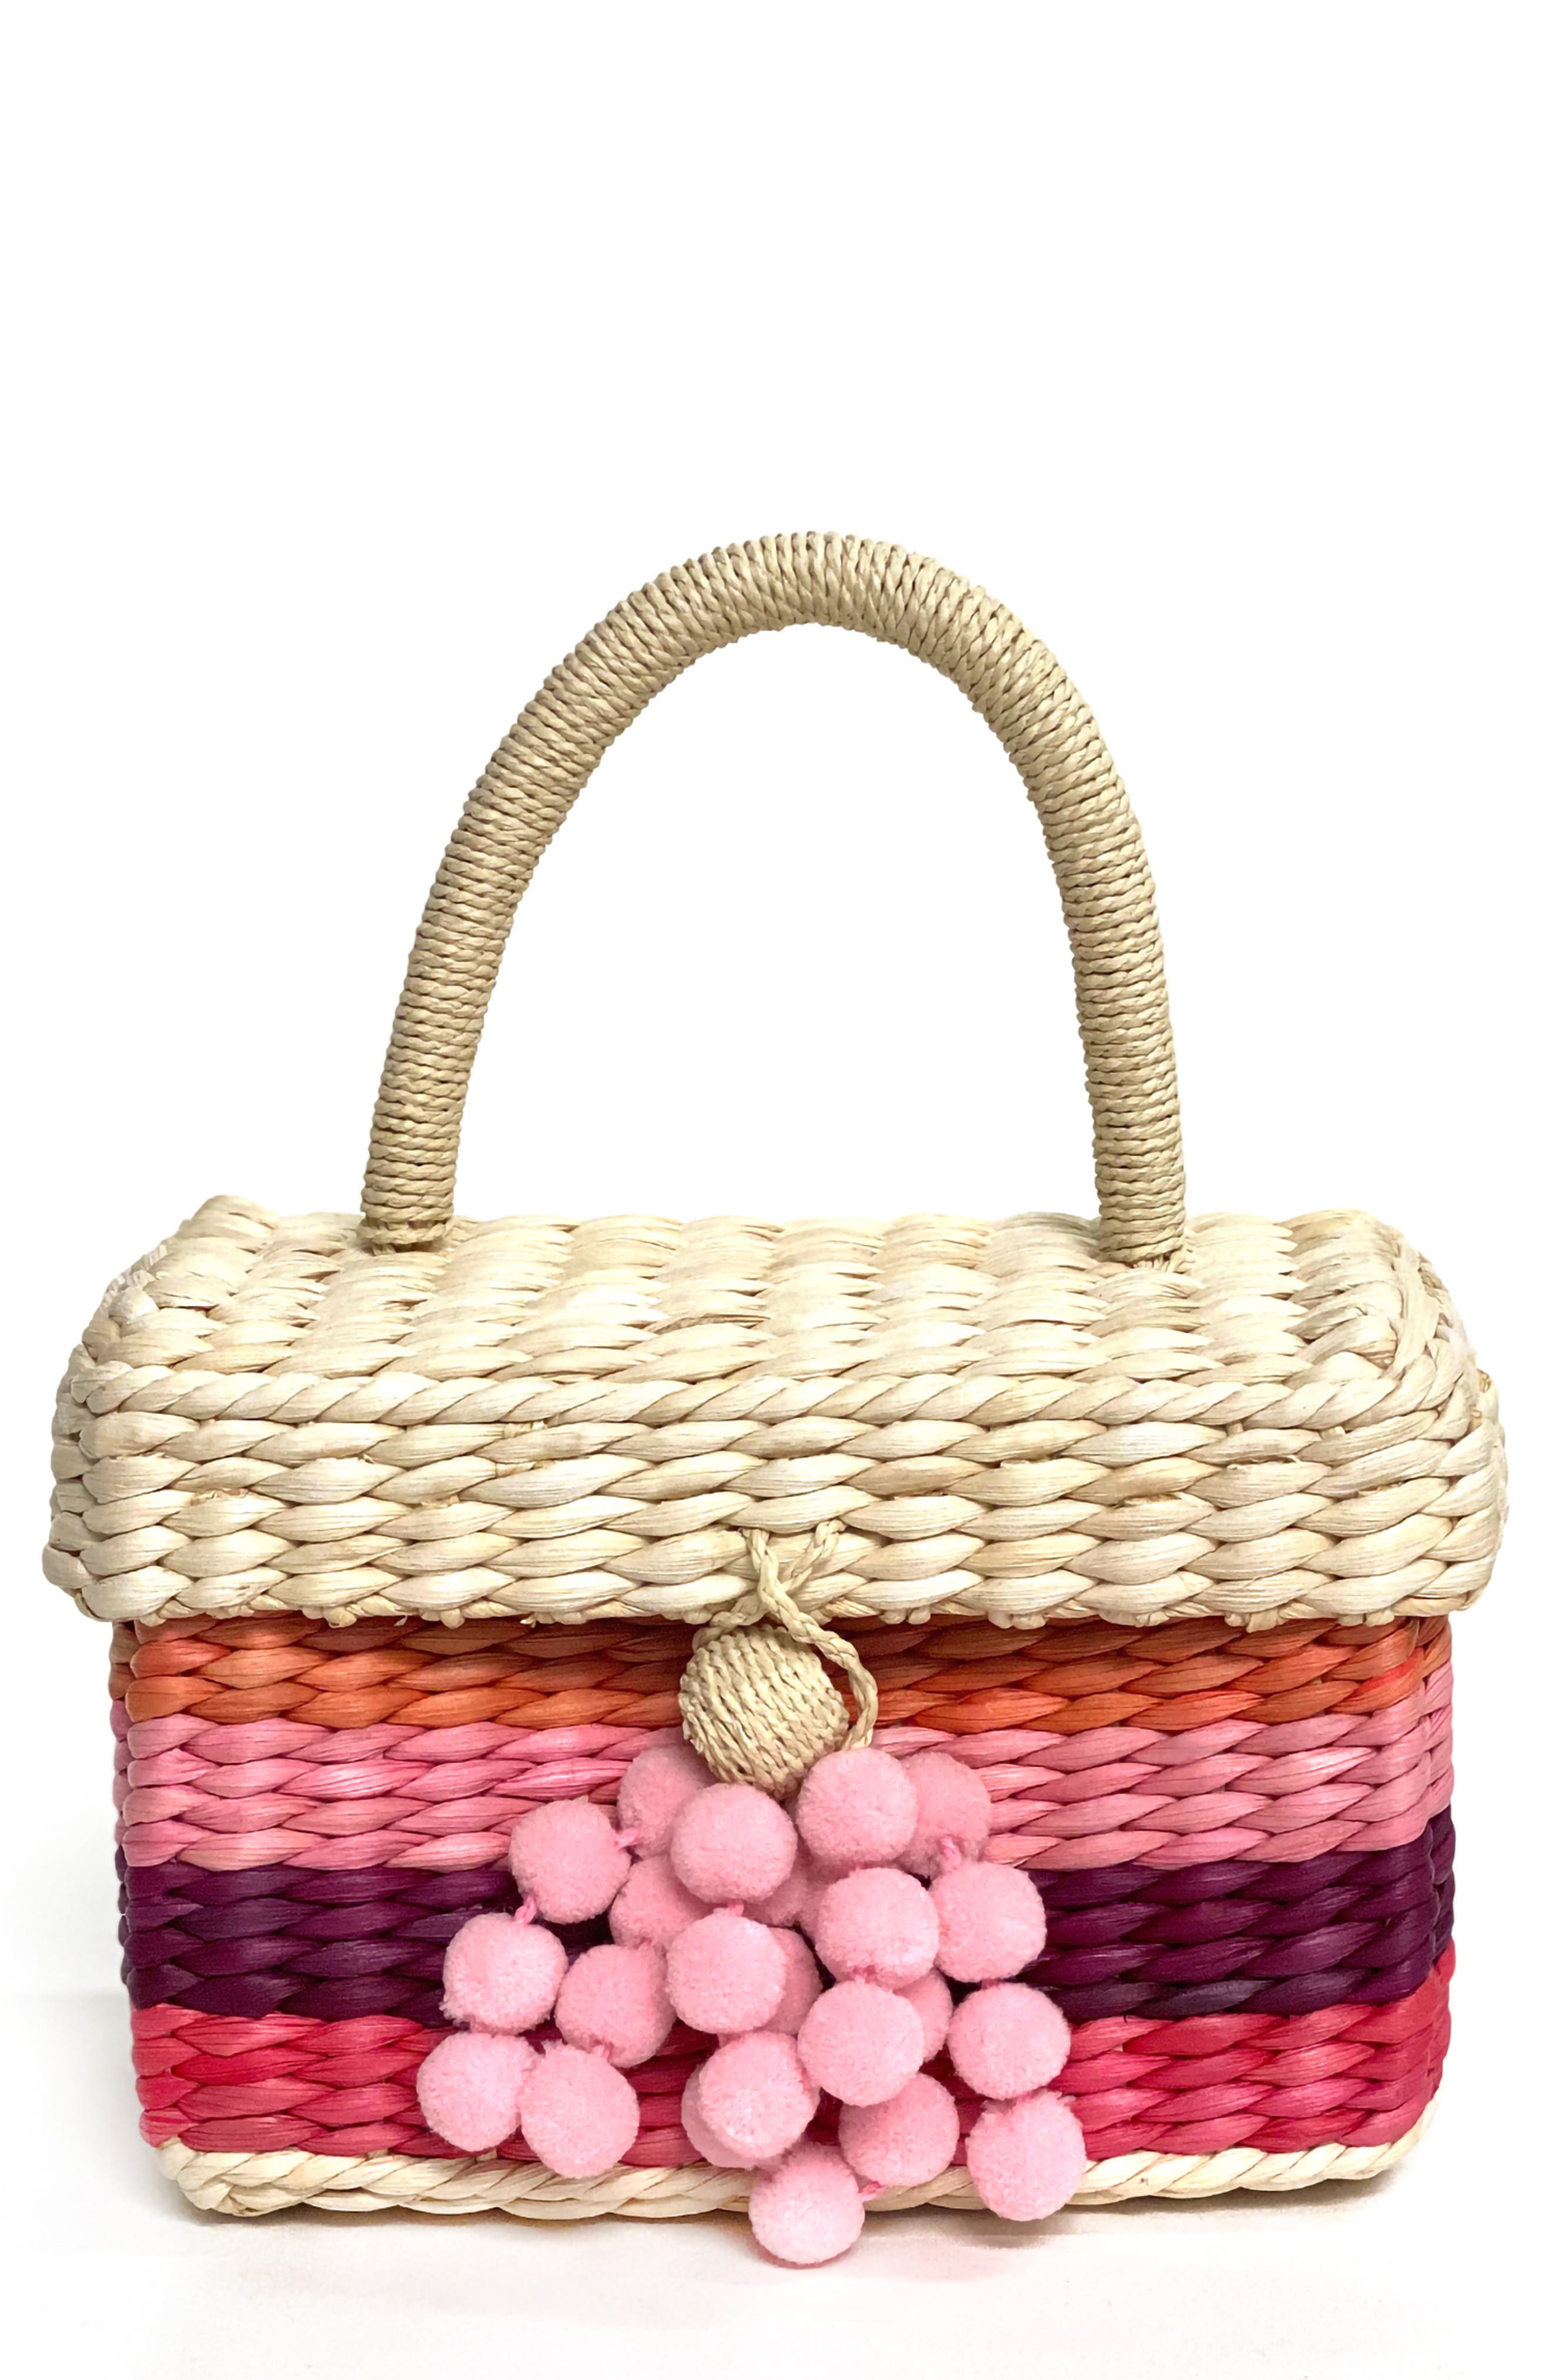 Sandy Beach Woven Basket